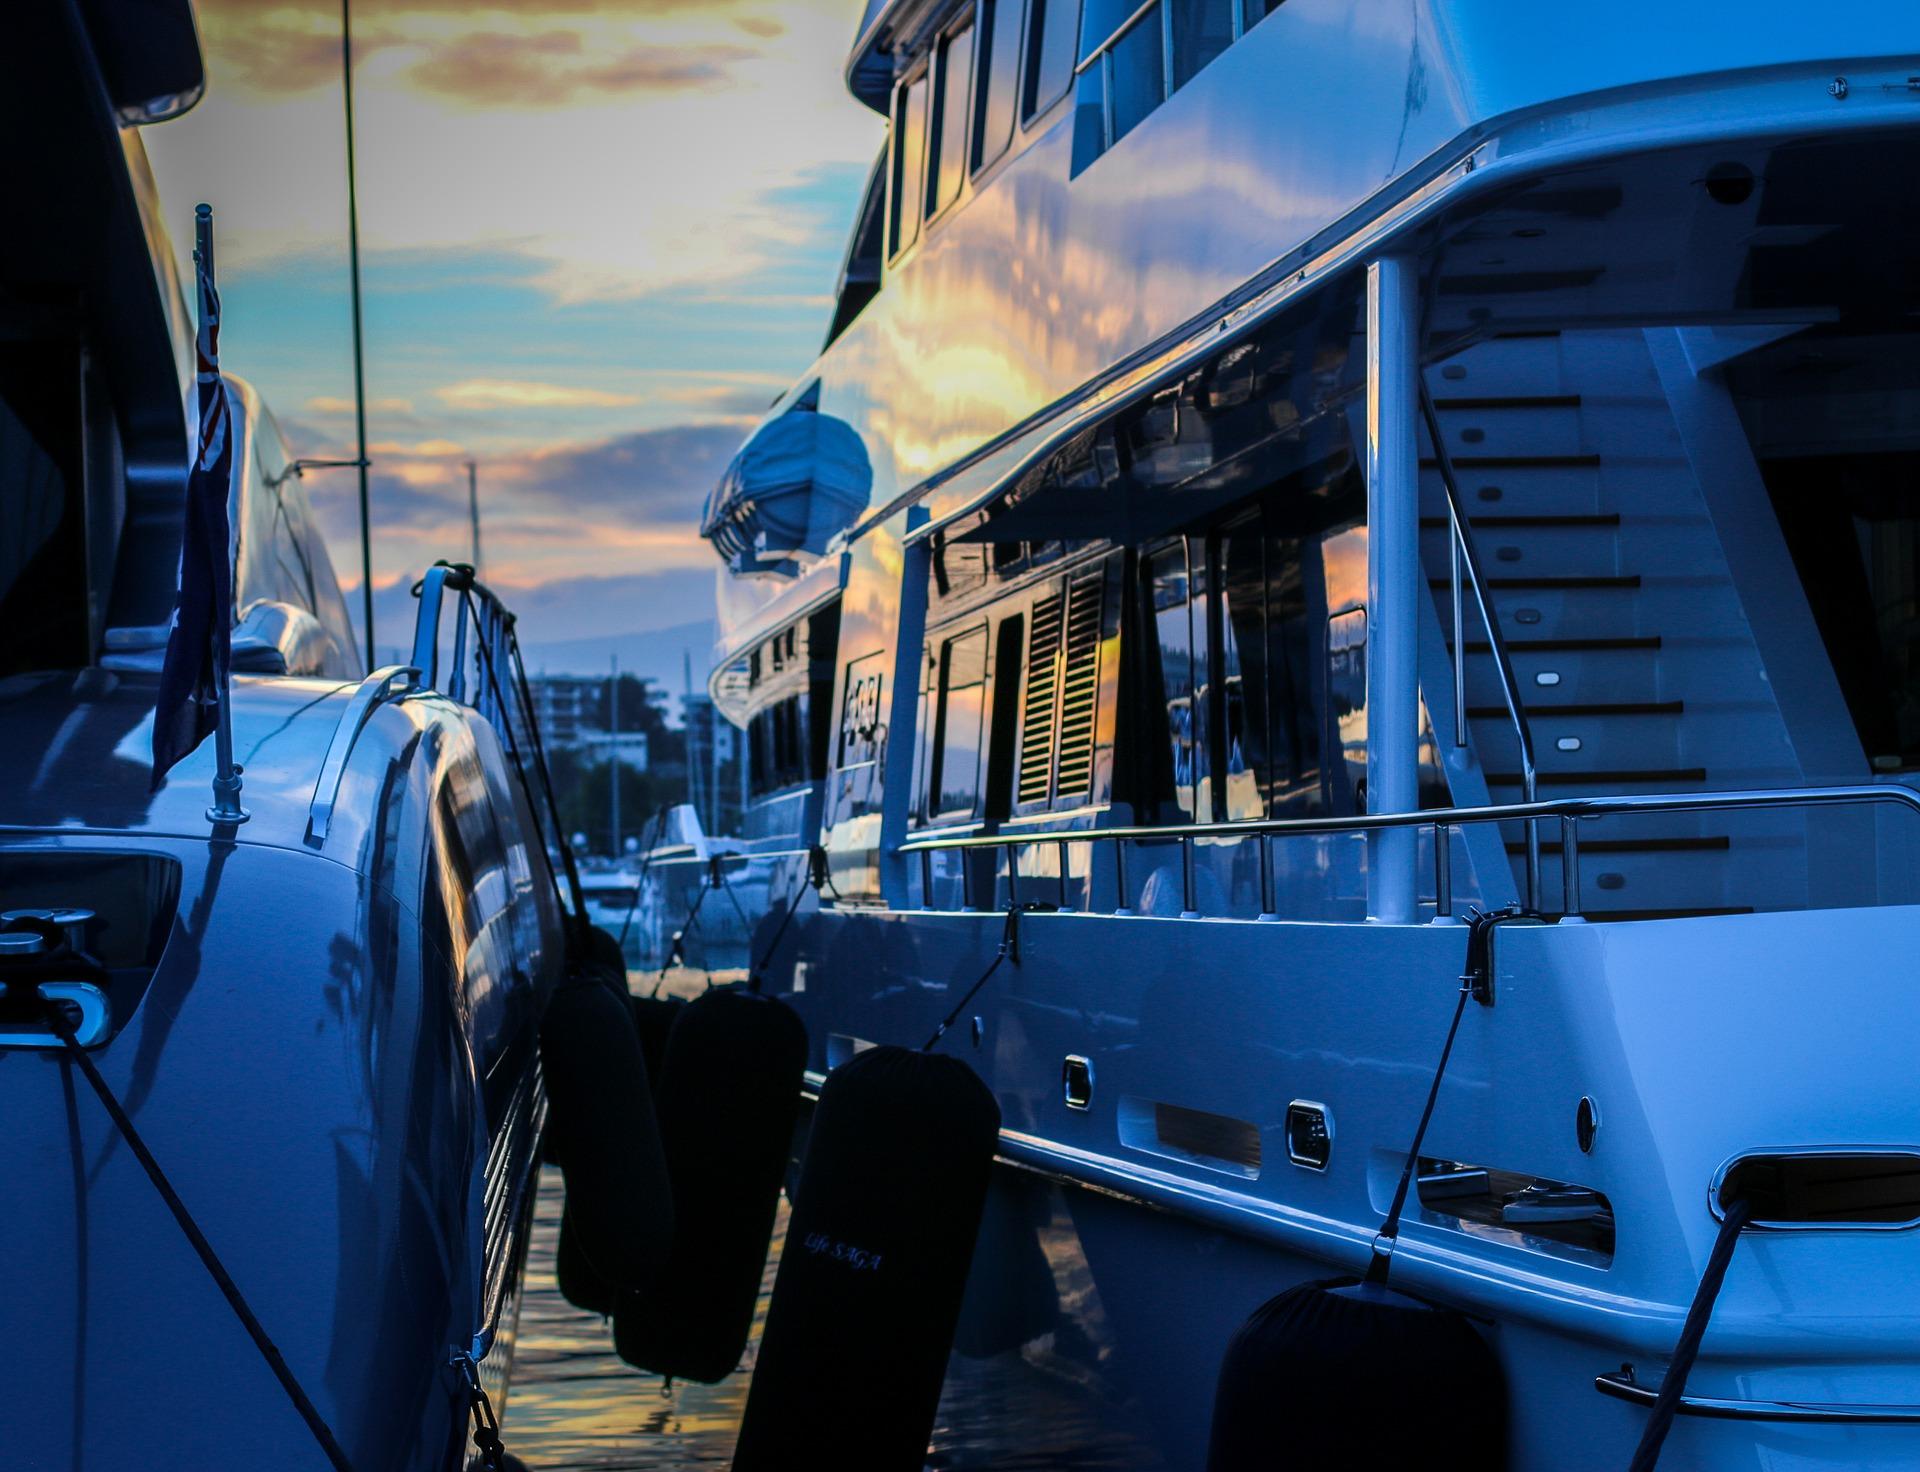 harbour docked luxury yacht